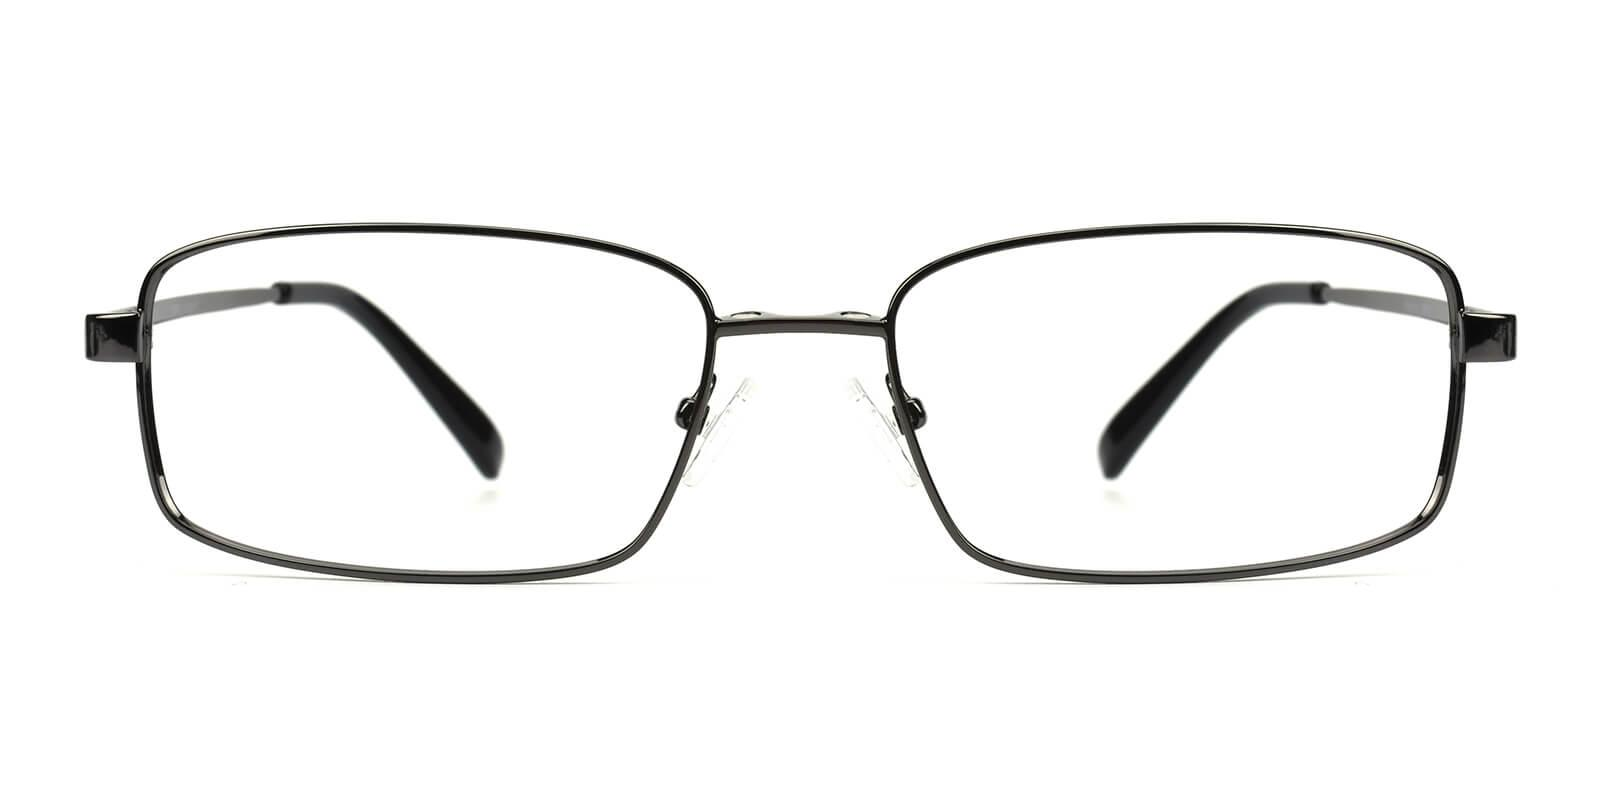 Alden-Gun-Rectangle-Metal-Eyeglasses-additional2